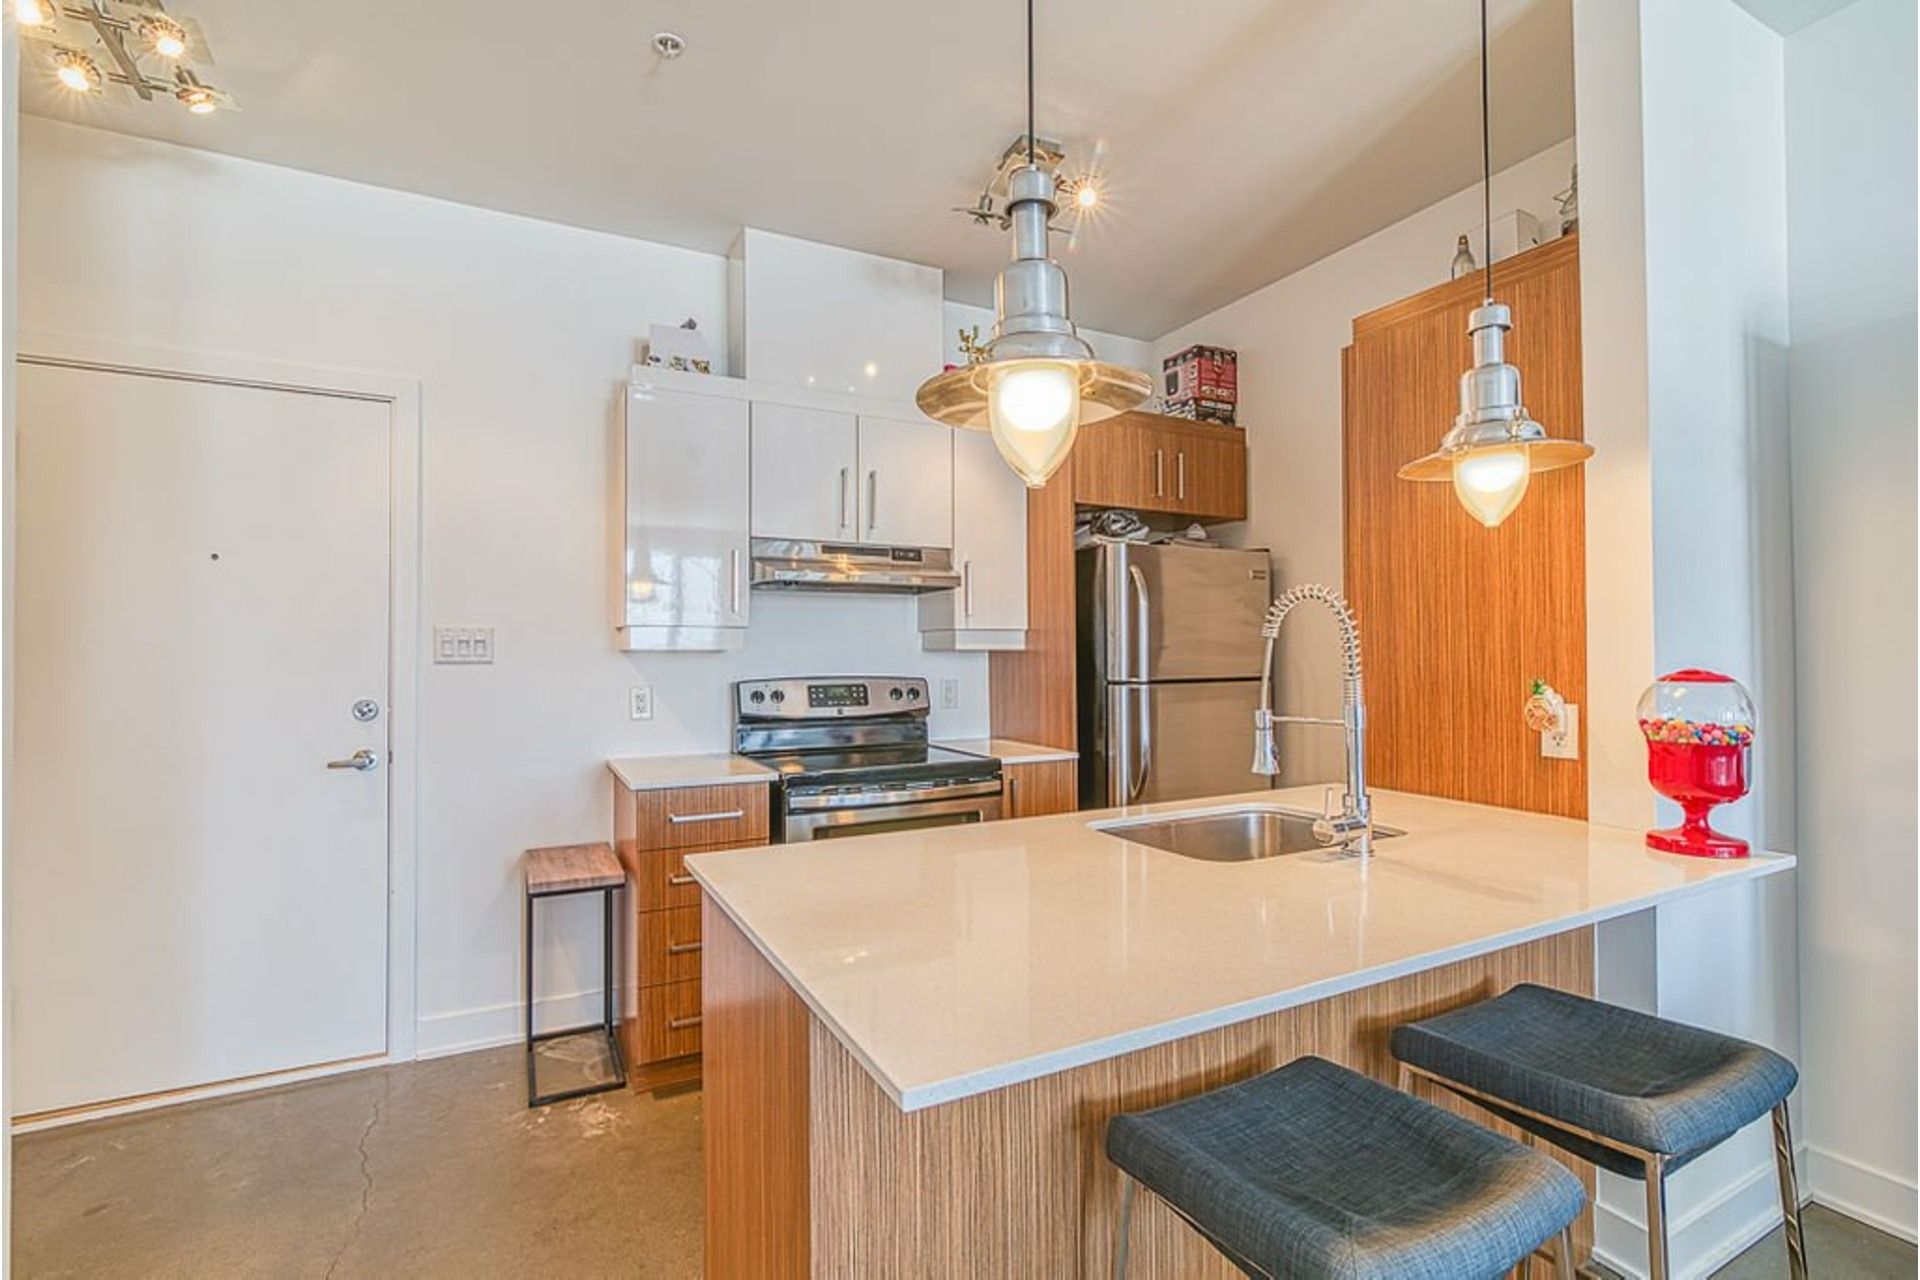 image 4 - Apartment For sale Blainville - 4 rooms